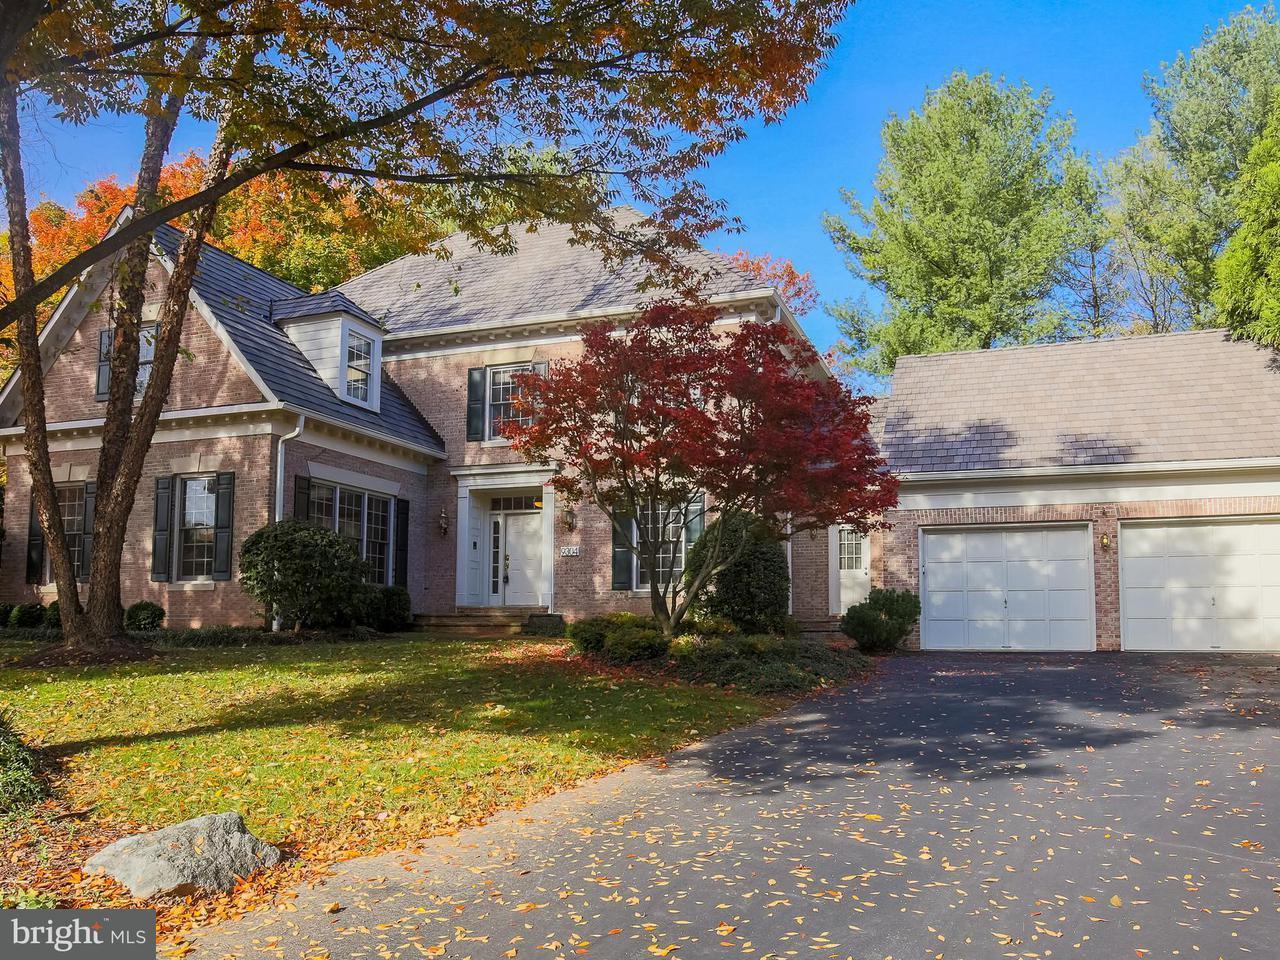 Single Family Home for Sale at 9304 Crimson Leaf Ter 9304 Crimson Leaf Ter Potomac, Maryland 20854 United States